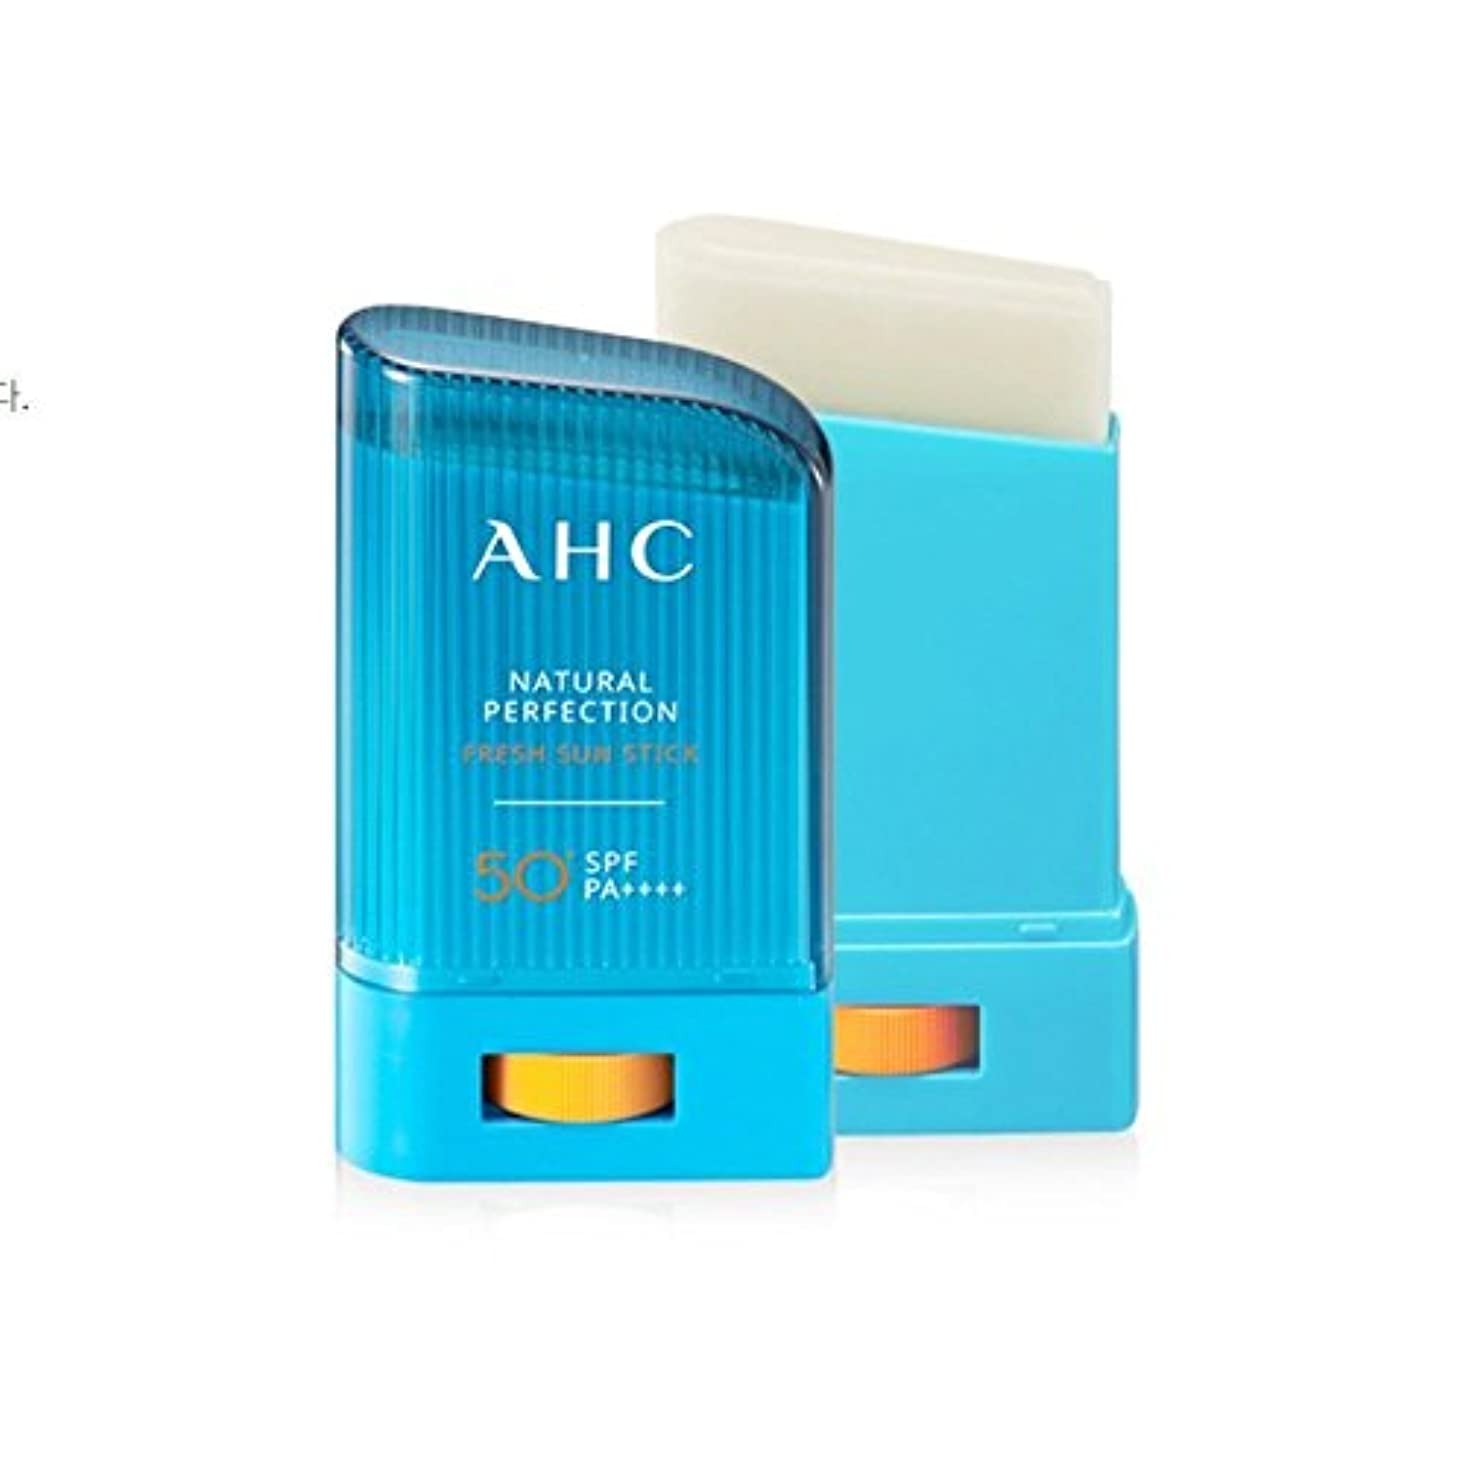 [1+1] AHC Natural Perfection Fresh Sun Stick ナチュラルパーフェクションフレッシュサンスティック 22g * 2個 [並行輸入品]